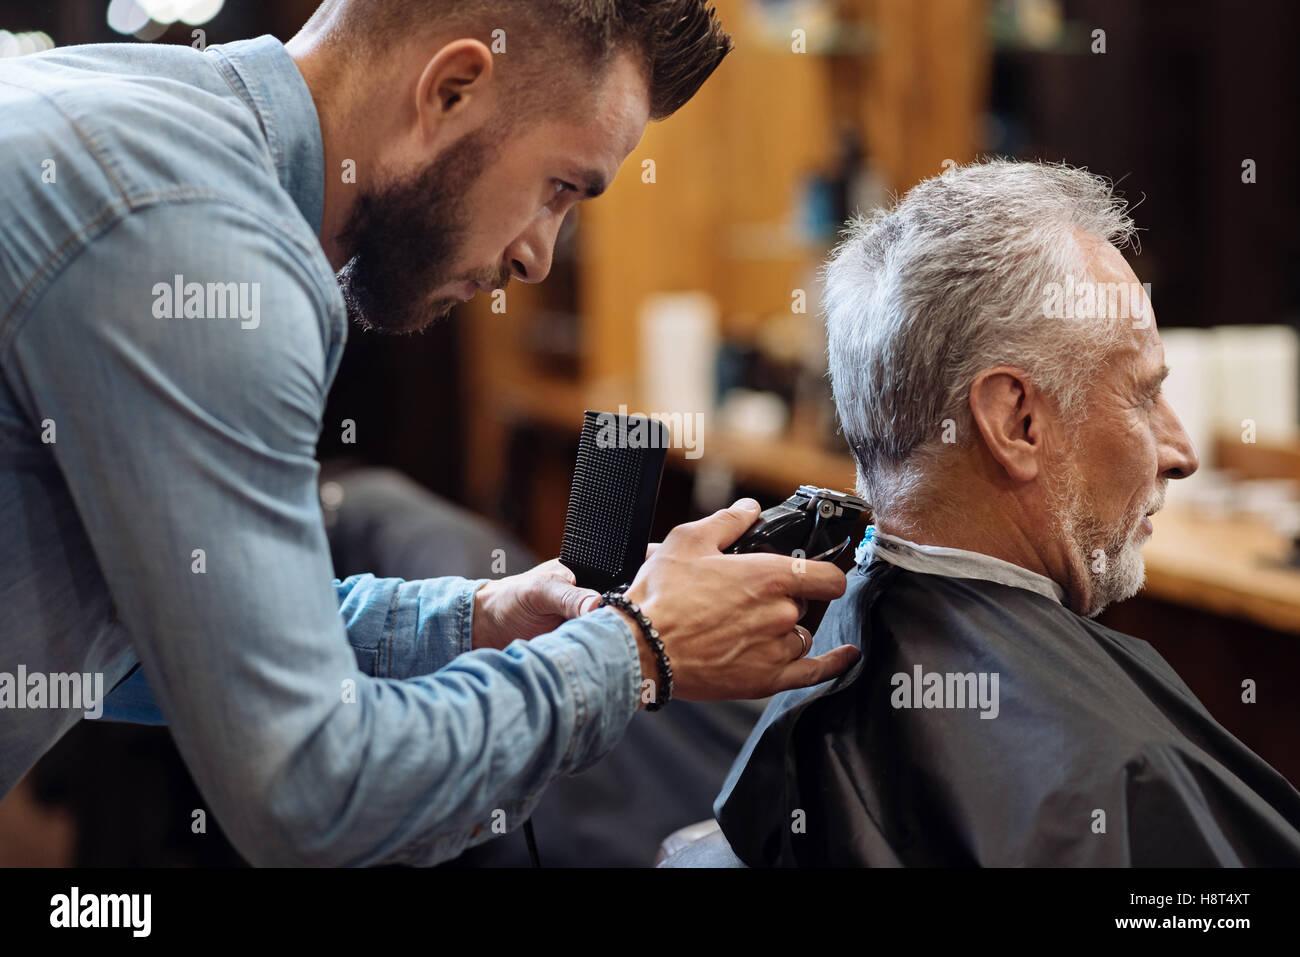 Hairdresser trimming neck of senior client - Stock Image